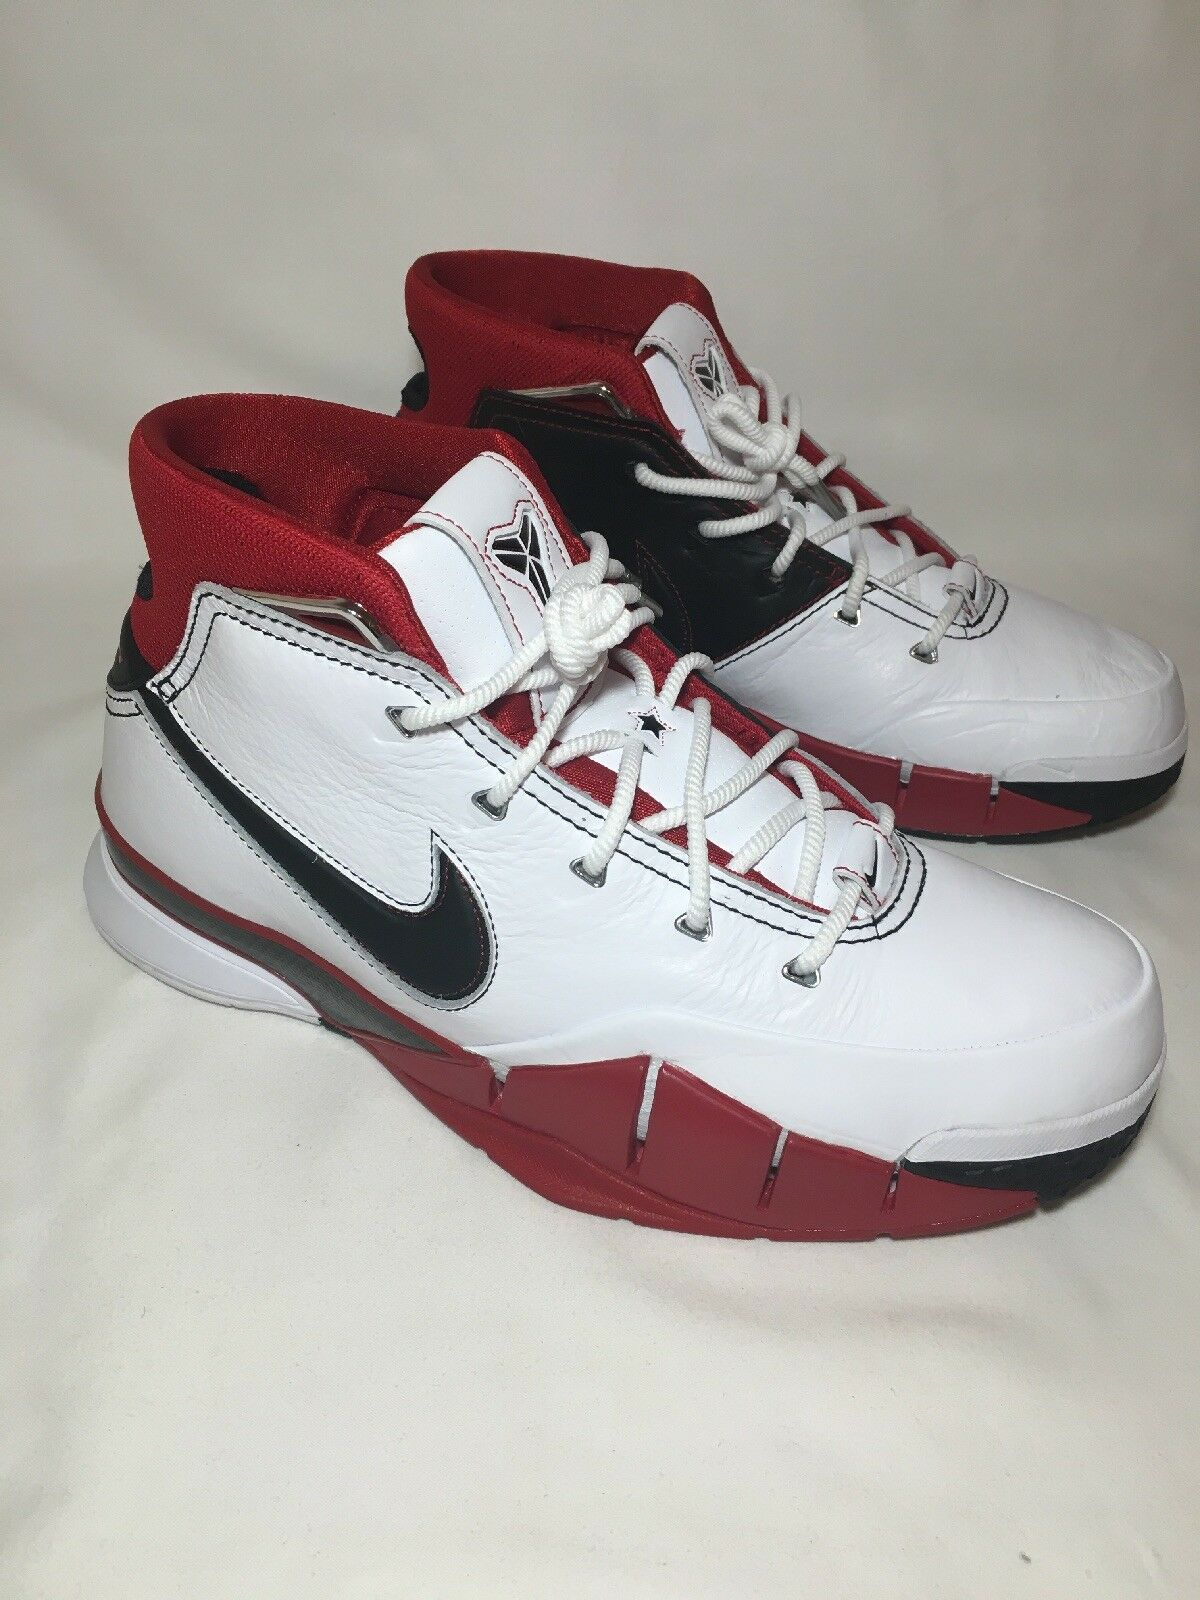 Nike Kobe 1 Predro All Star White Black-Varsity Red; Men's Sz 12 (AQ2728-102)